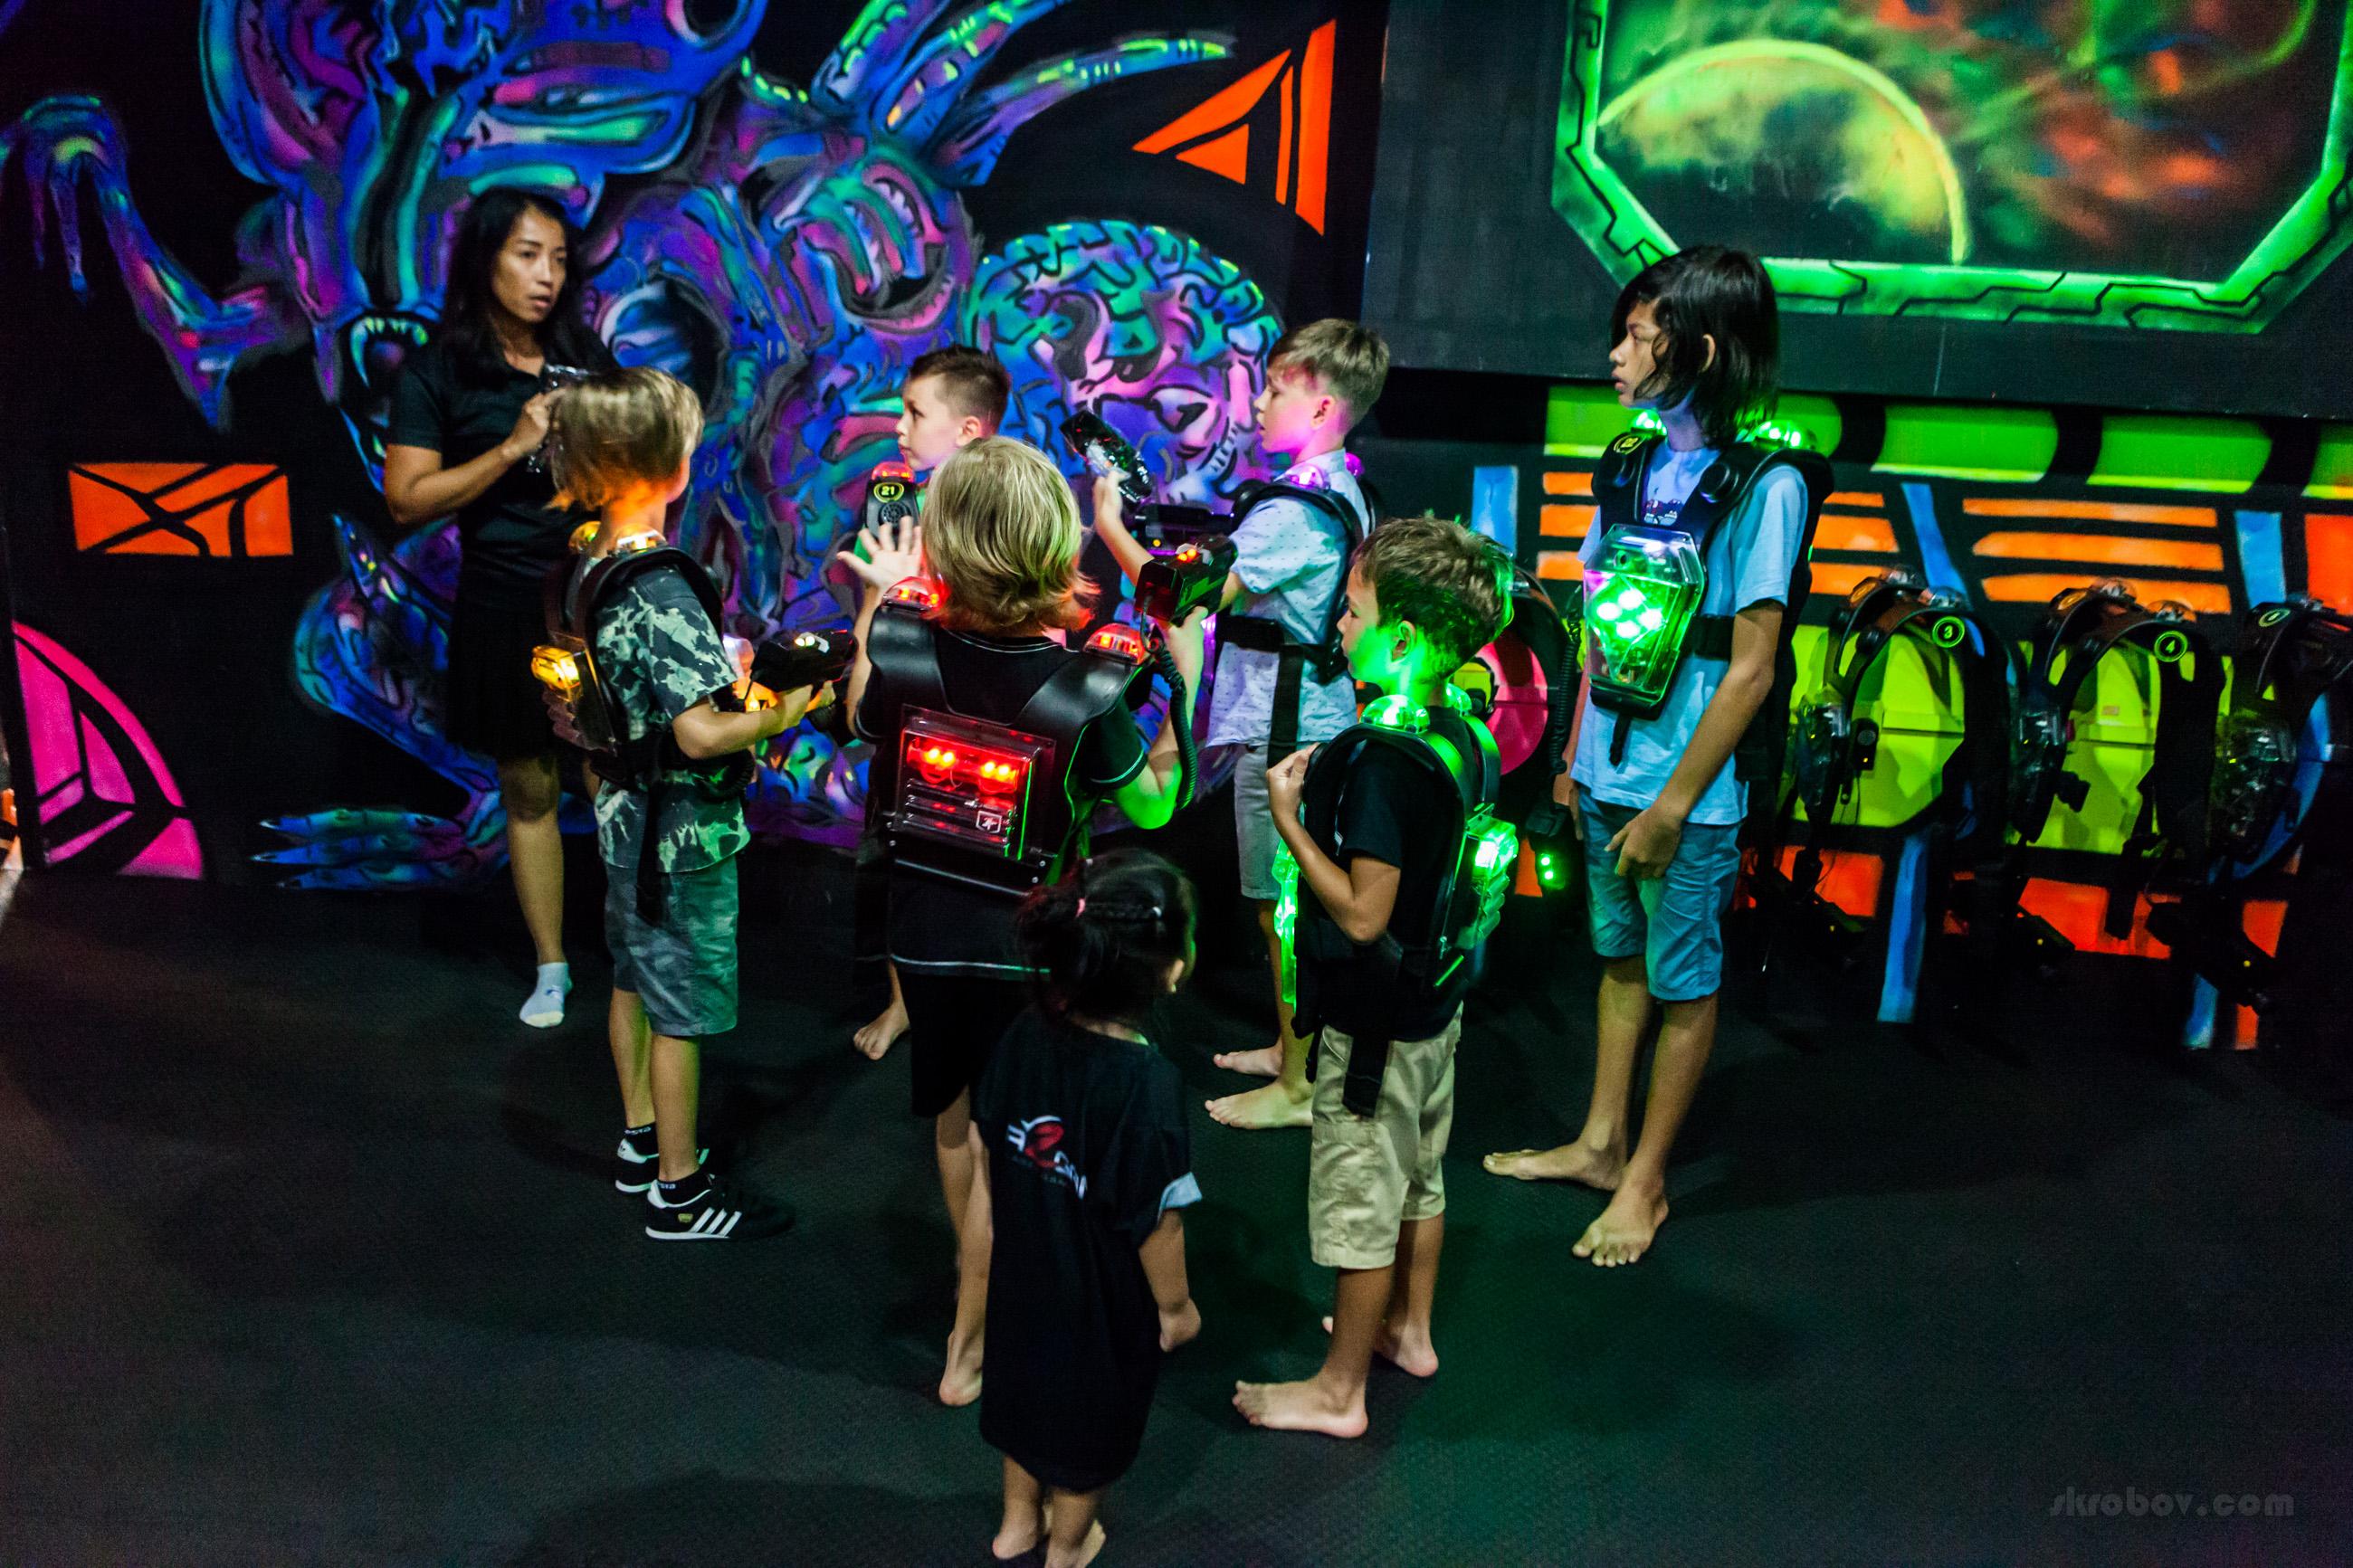 Laser Games, Koh Samui, Thailand